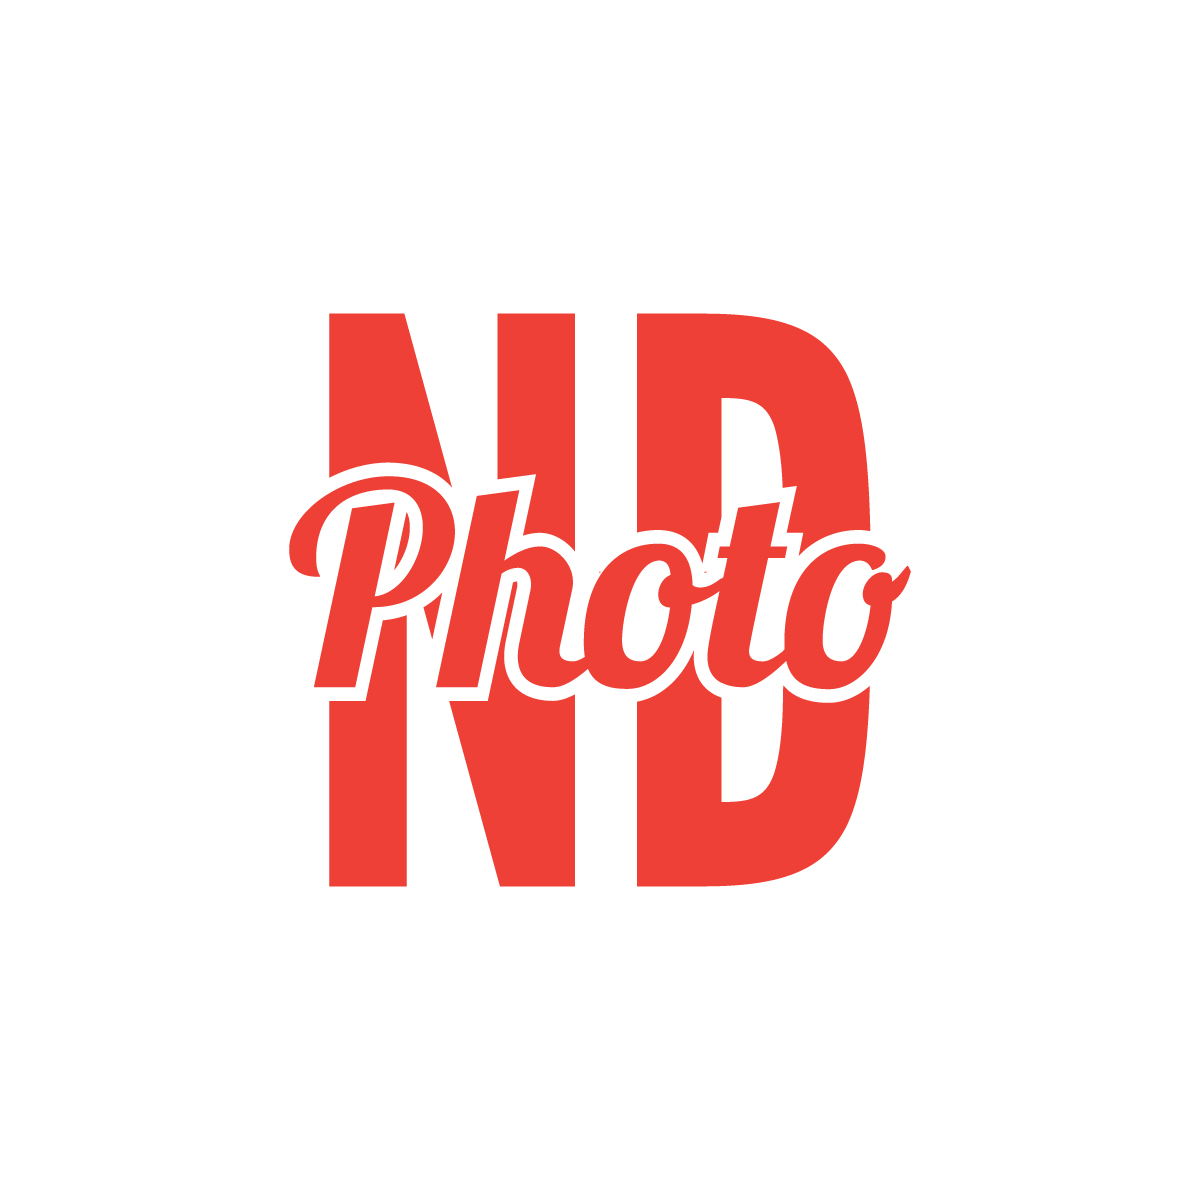 nd_photo.jpg